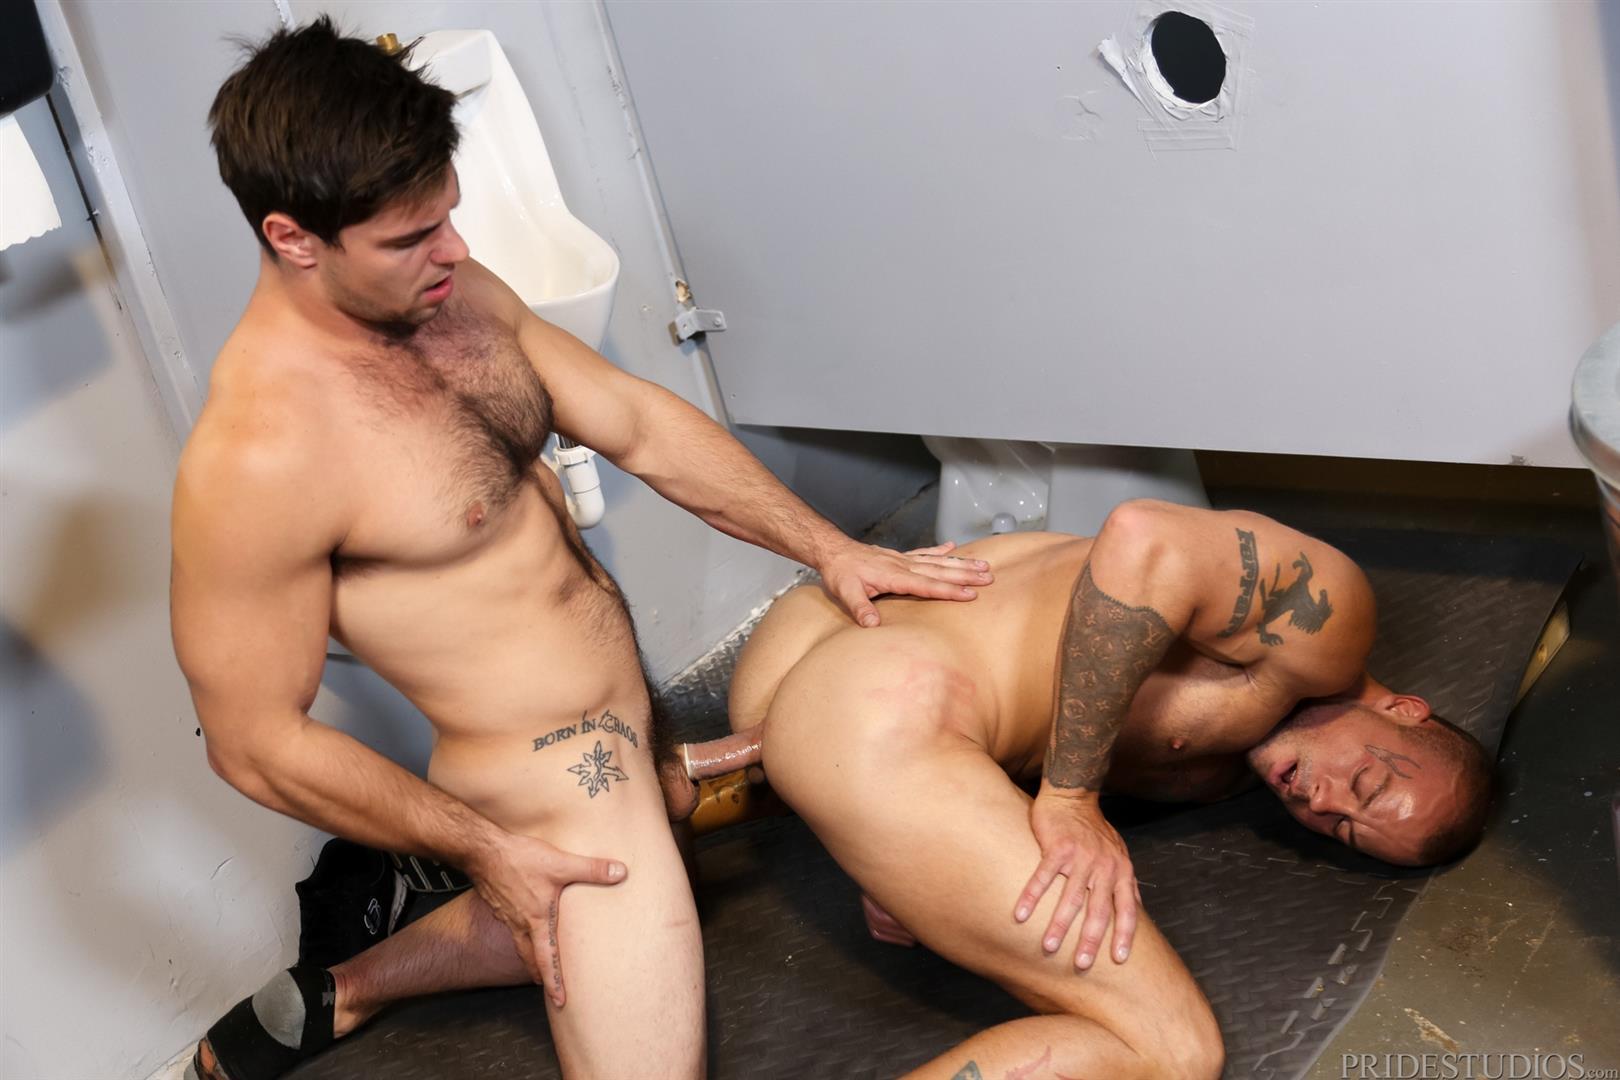 Extra-Big-Dicks-Sean-Duran-Fucking-Through-A-Glory-Hole-Amateur-Gay-Porn-13 Getting Fucked By A Big Fat Cock Through a Glory Hole